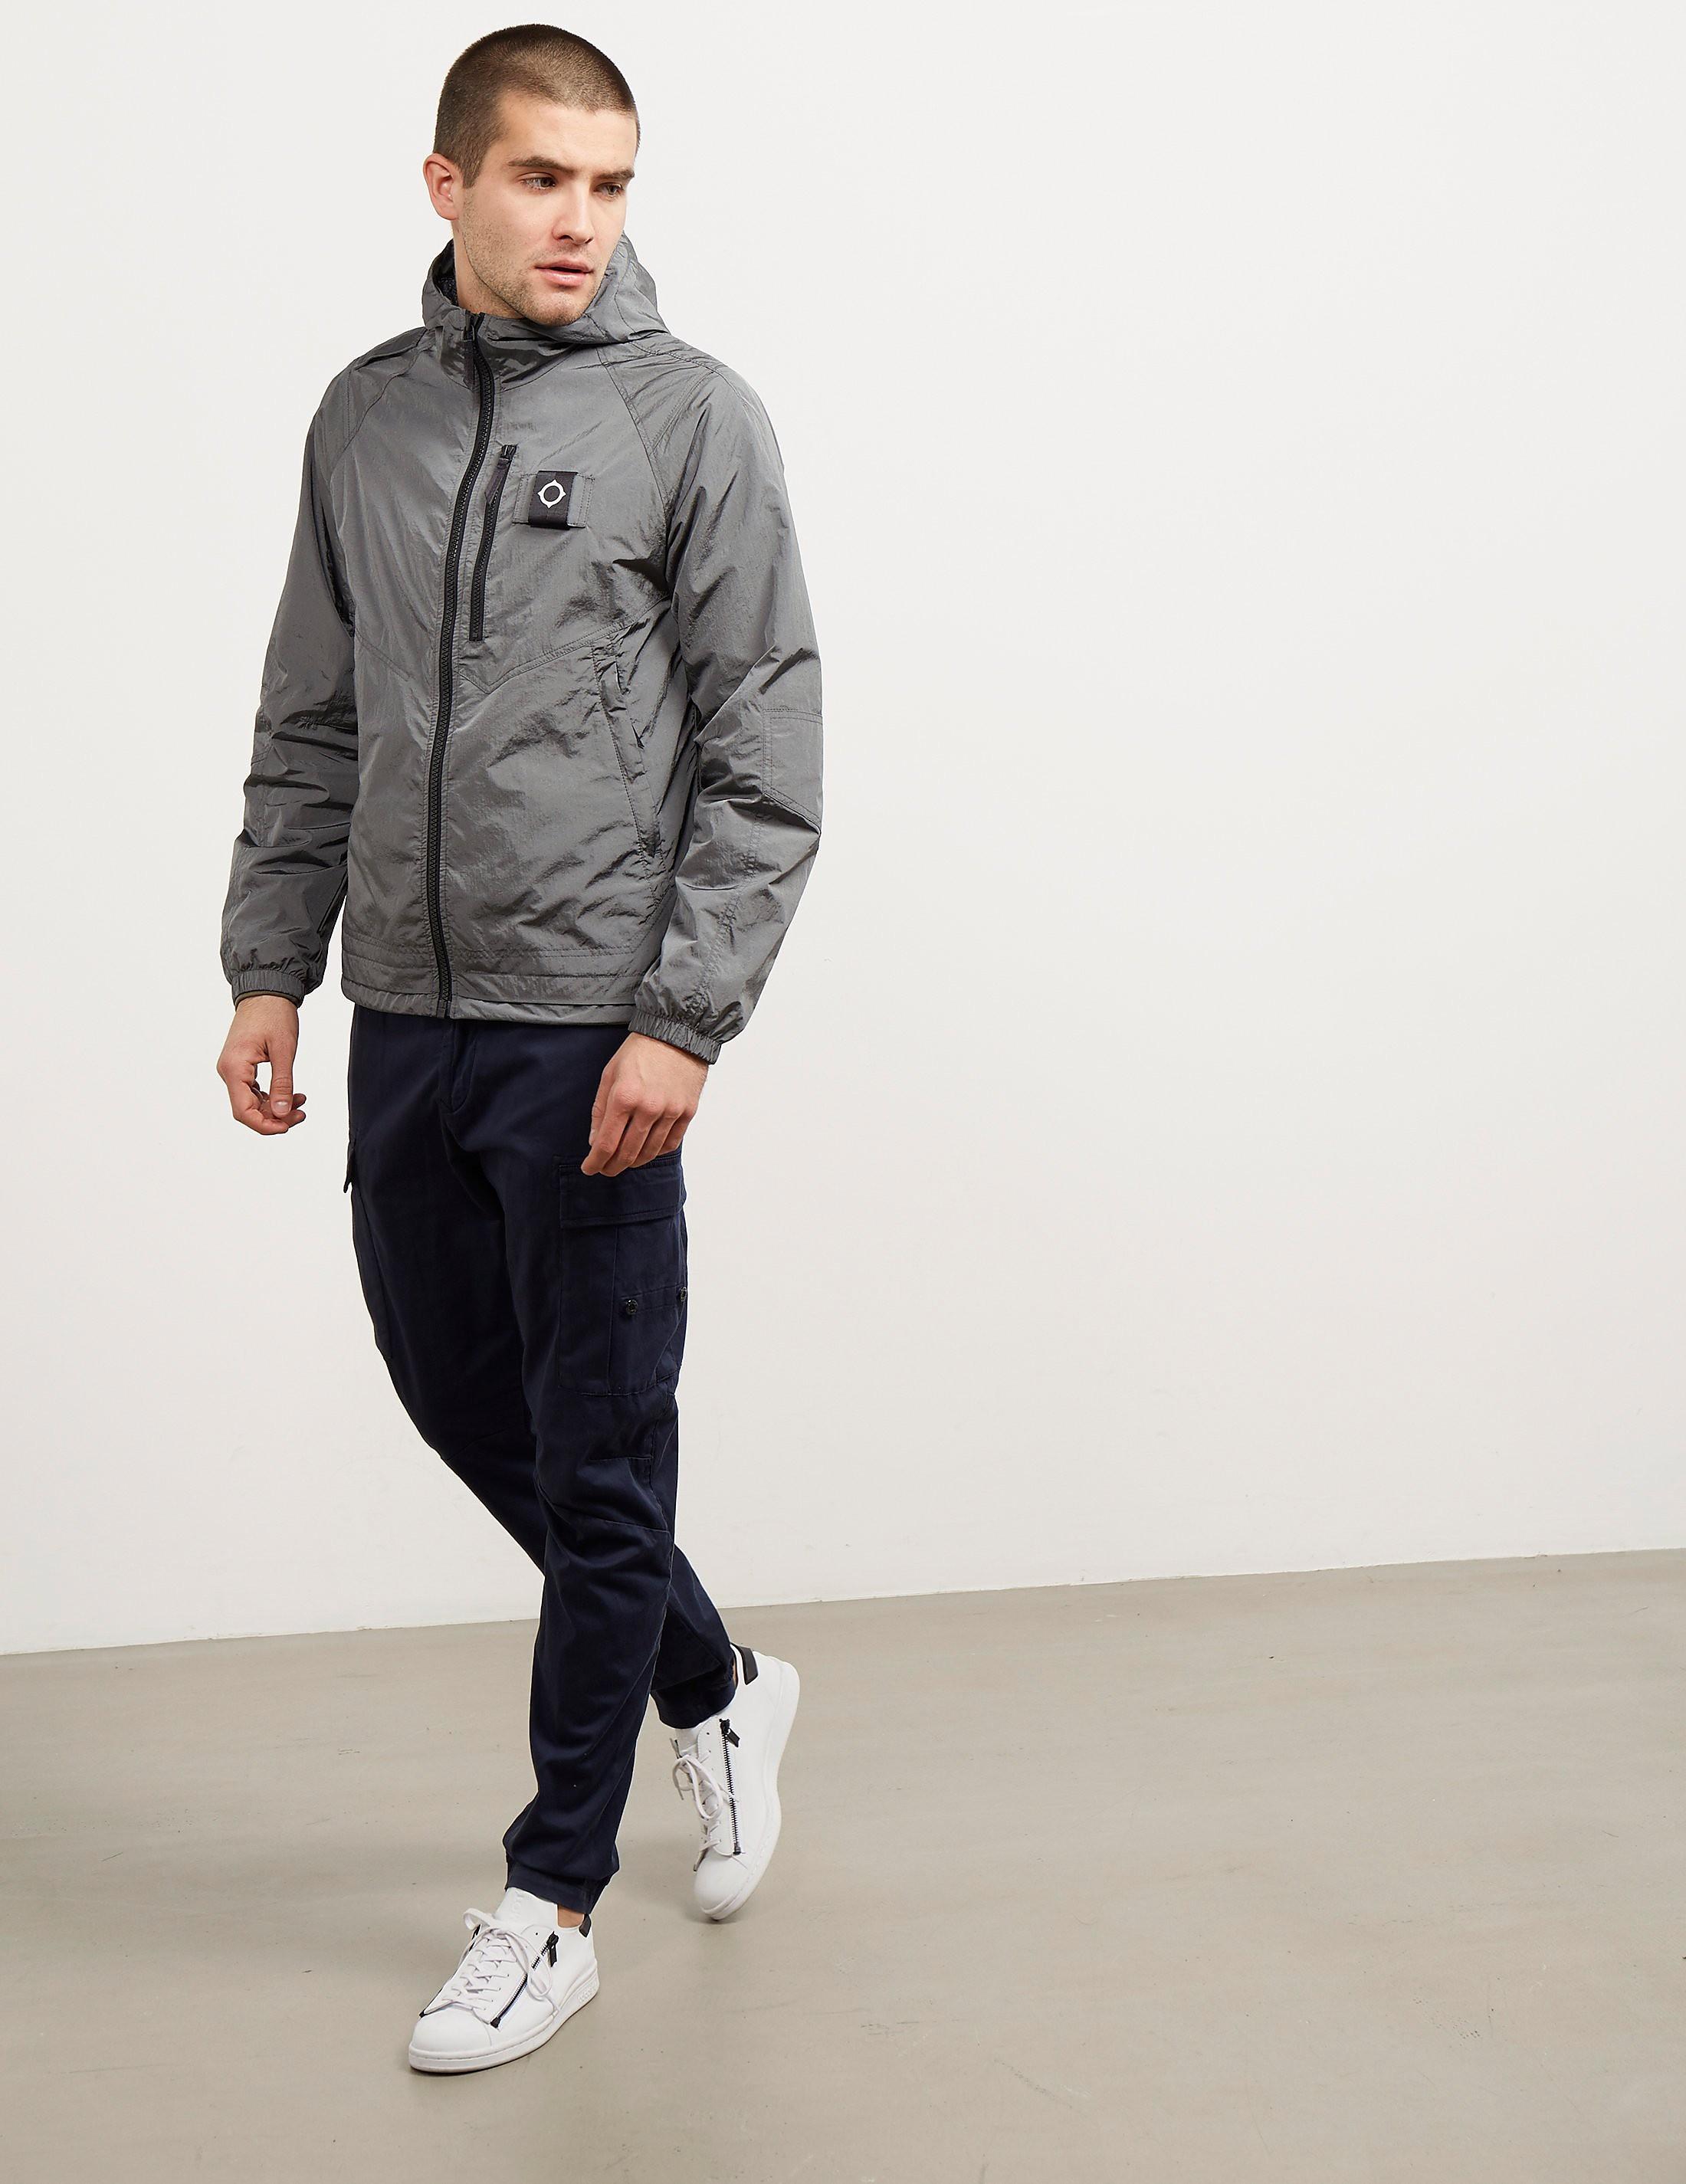 MA STRUM Pegasus Nylon Lightweight Jacket